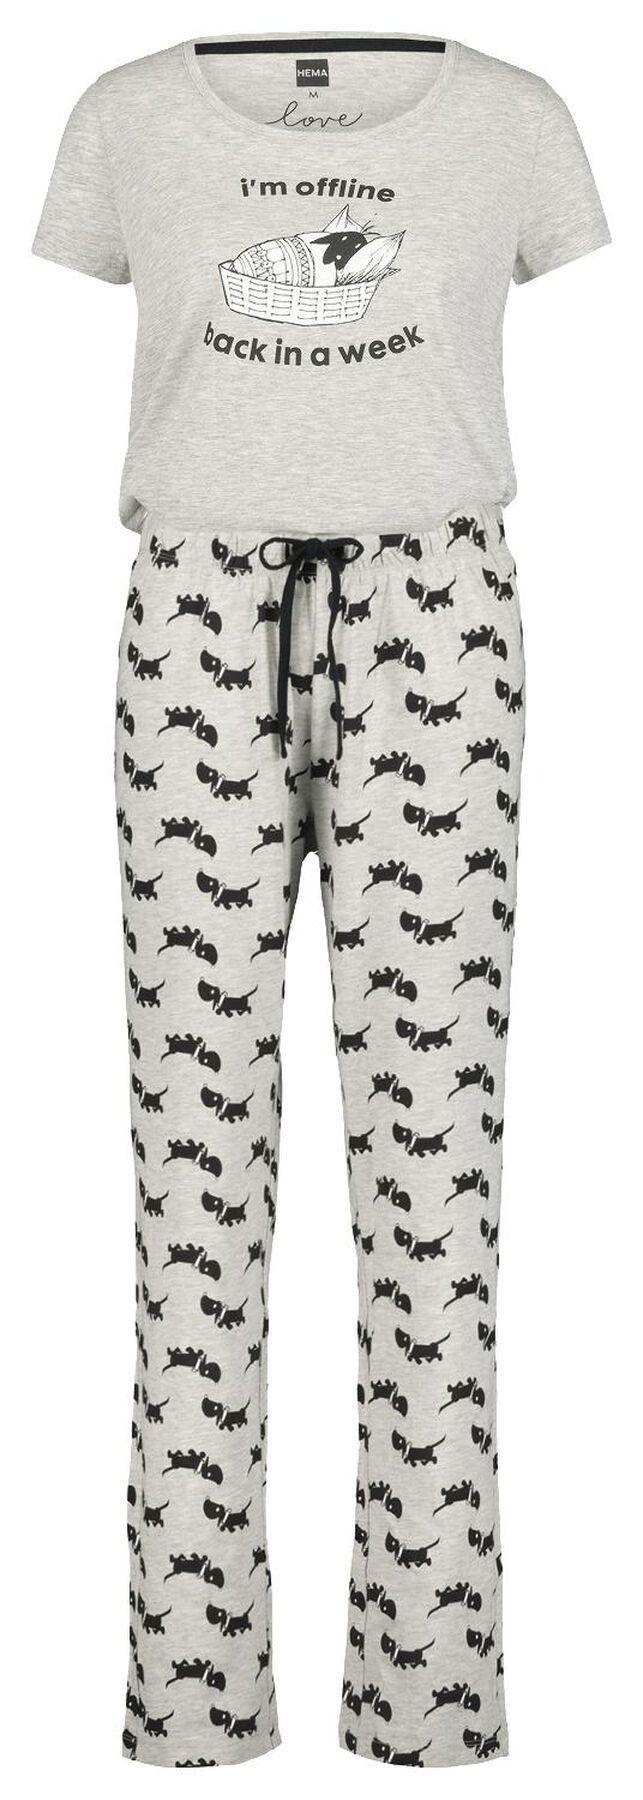 b9347dfe03424b1b091e9ab527272bdc - Dames Pyjama Met Korte Broek